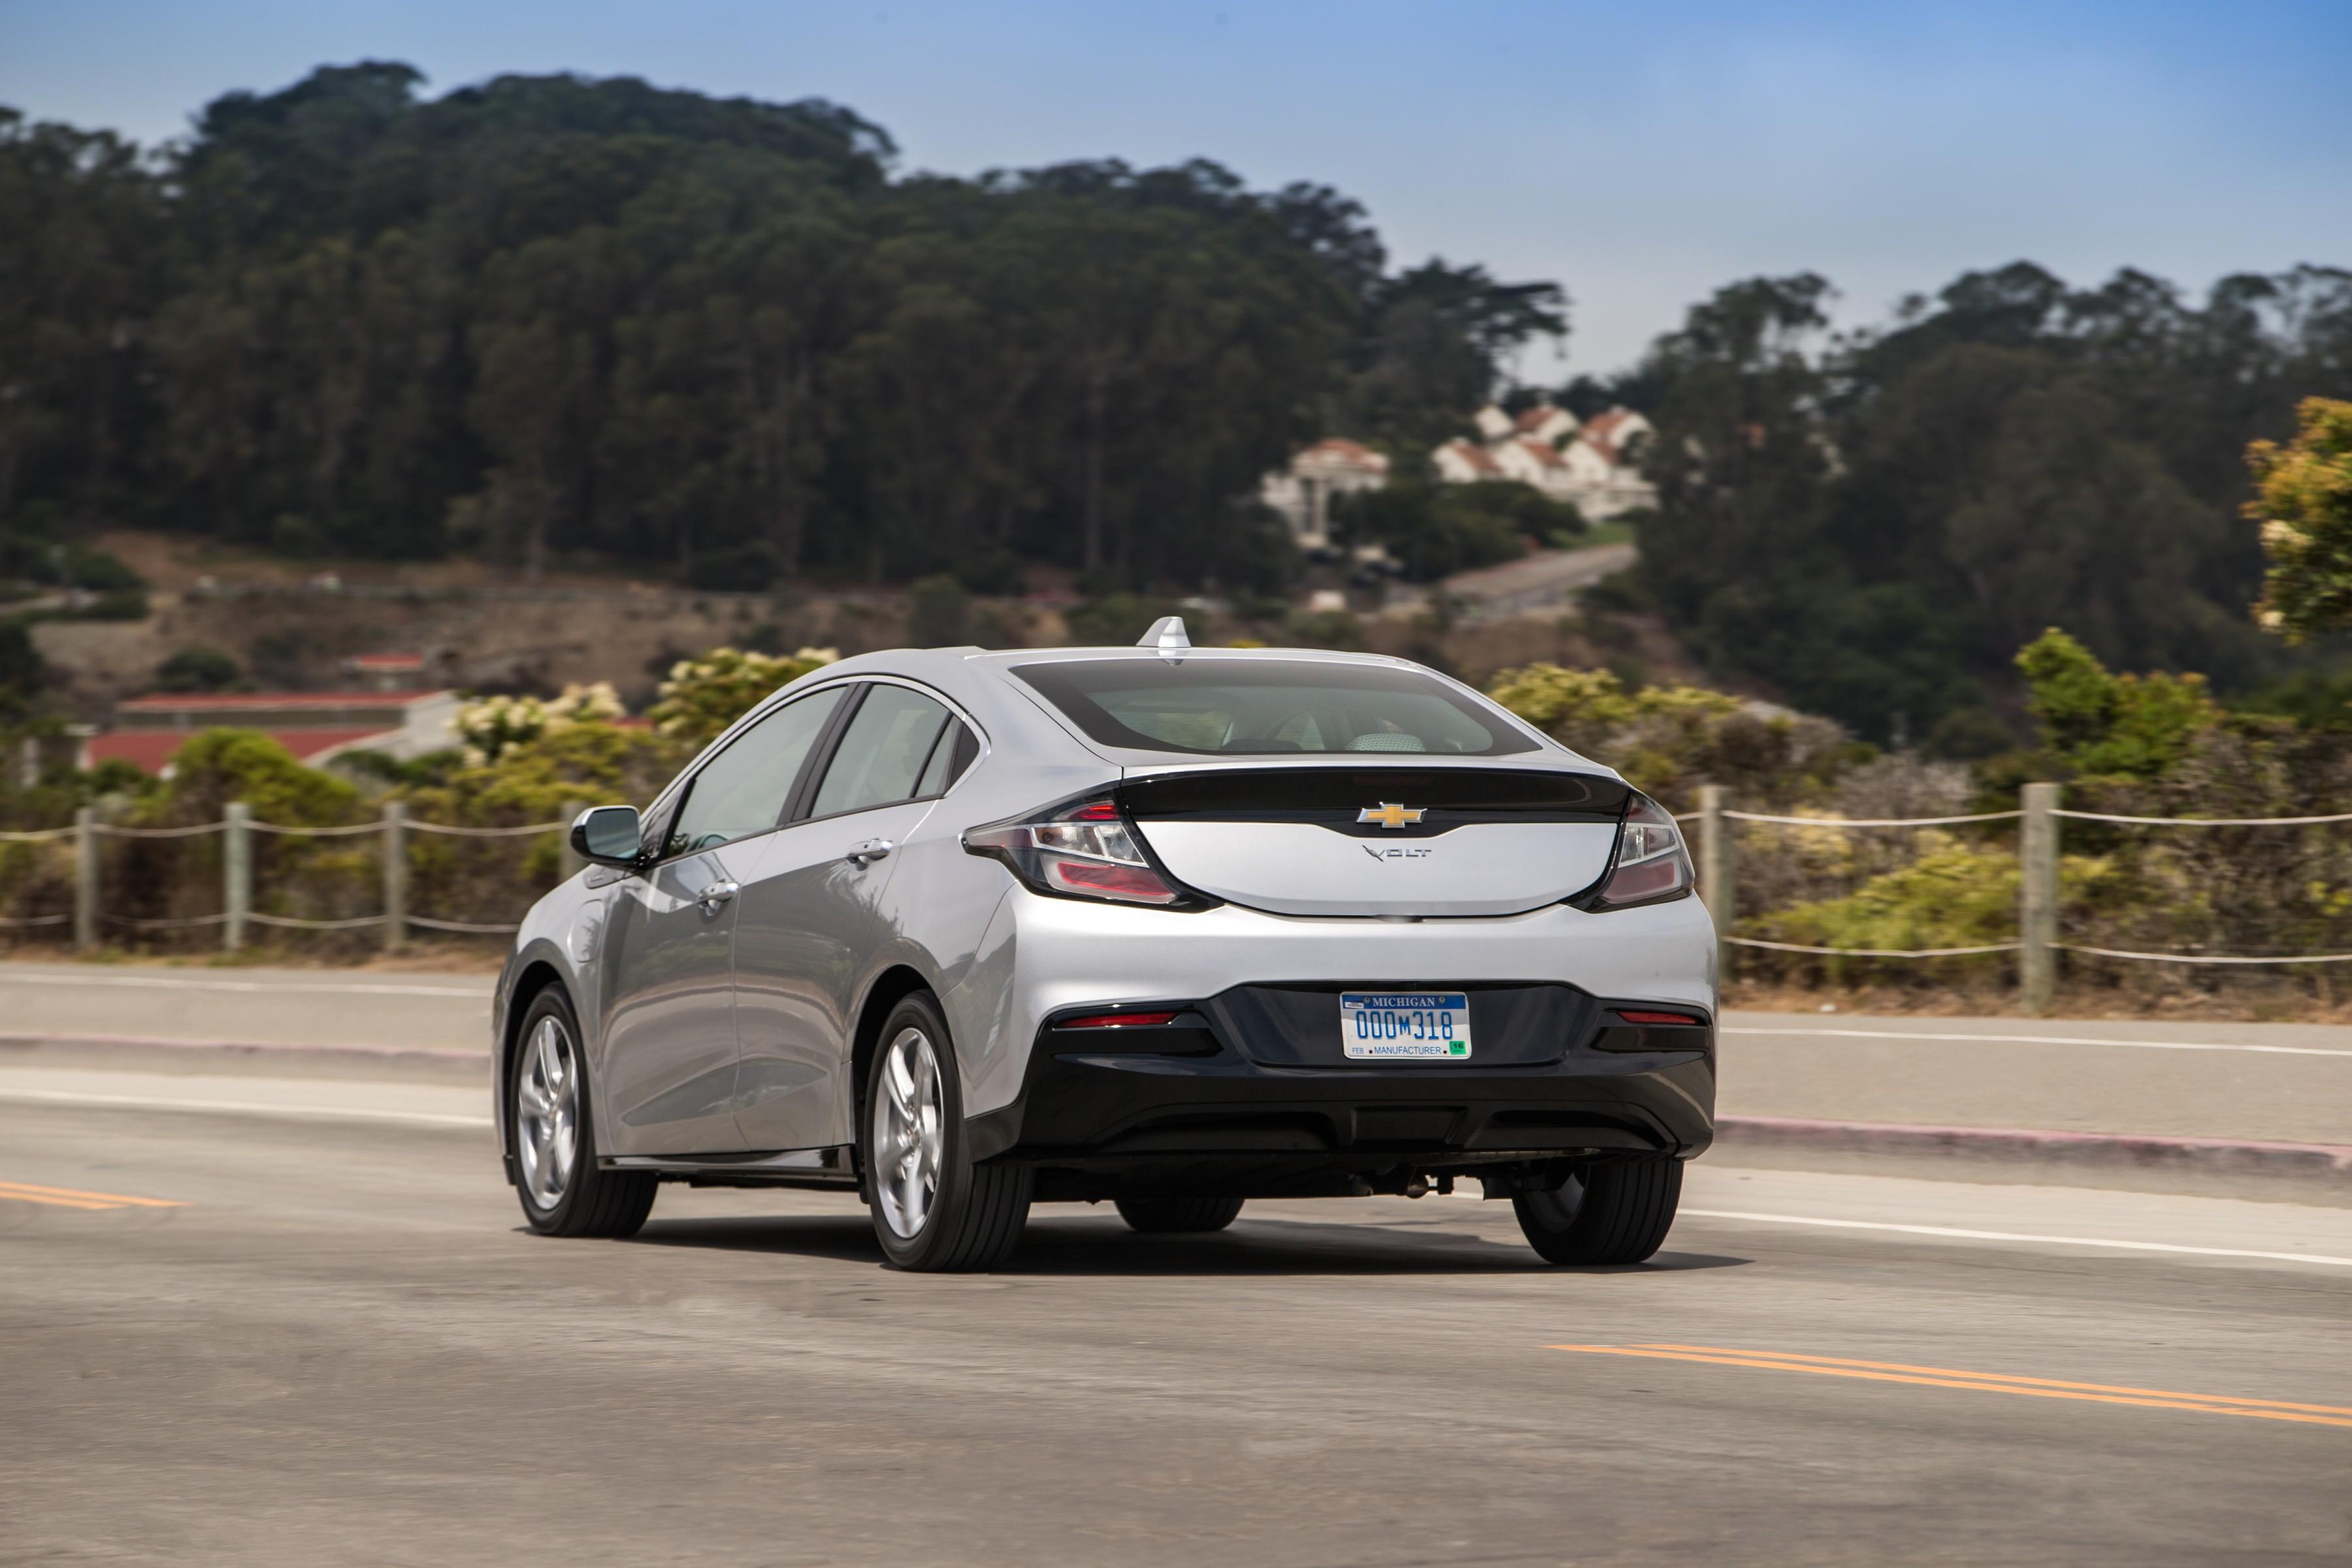 2017 Chevrolet Volt >> 2019 Chevrolet Volt Upgraded To 7.2 kW Charging System - autoevolution